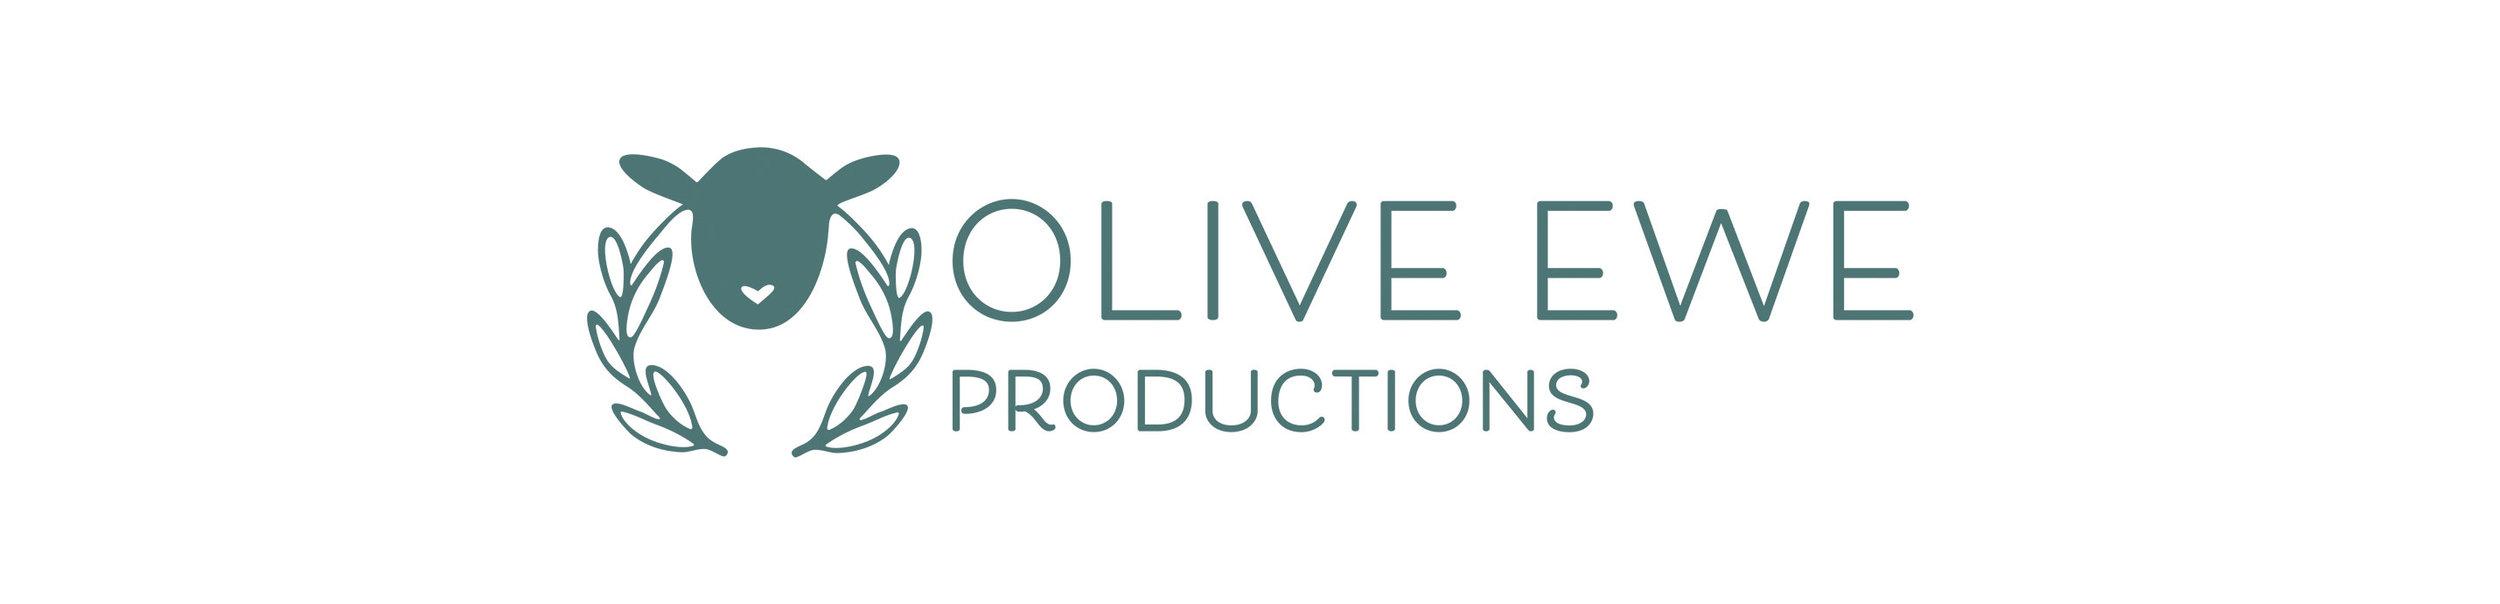 Studio-Eighty-Seven-Logo-Design-Olive-Ewe-Productions_Secondary-Image.jpg